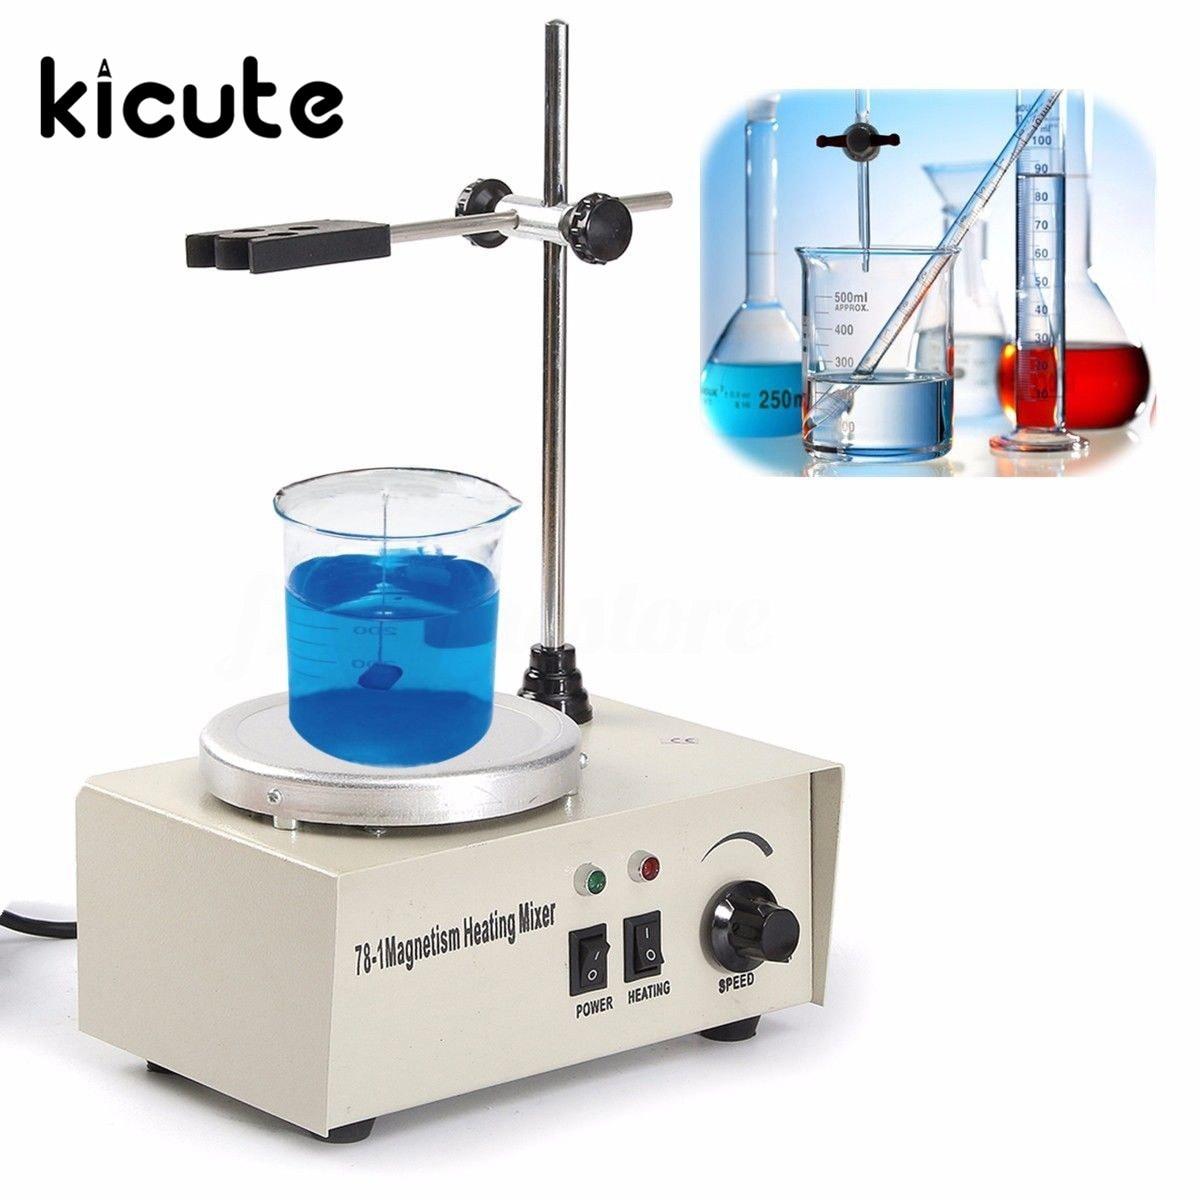 220V 150W 1000ML Magnetic Stirrer Mixer Machine Heating 78-1 Hot Plate Medical Laboratory Tool цена